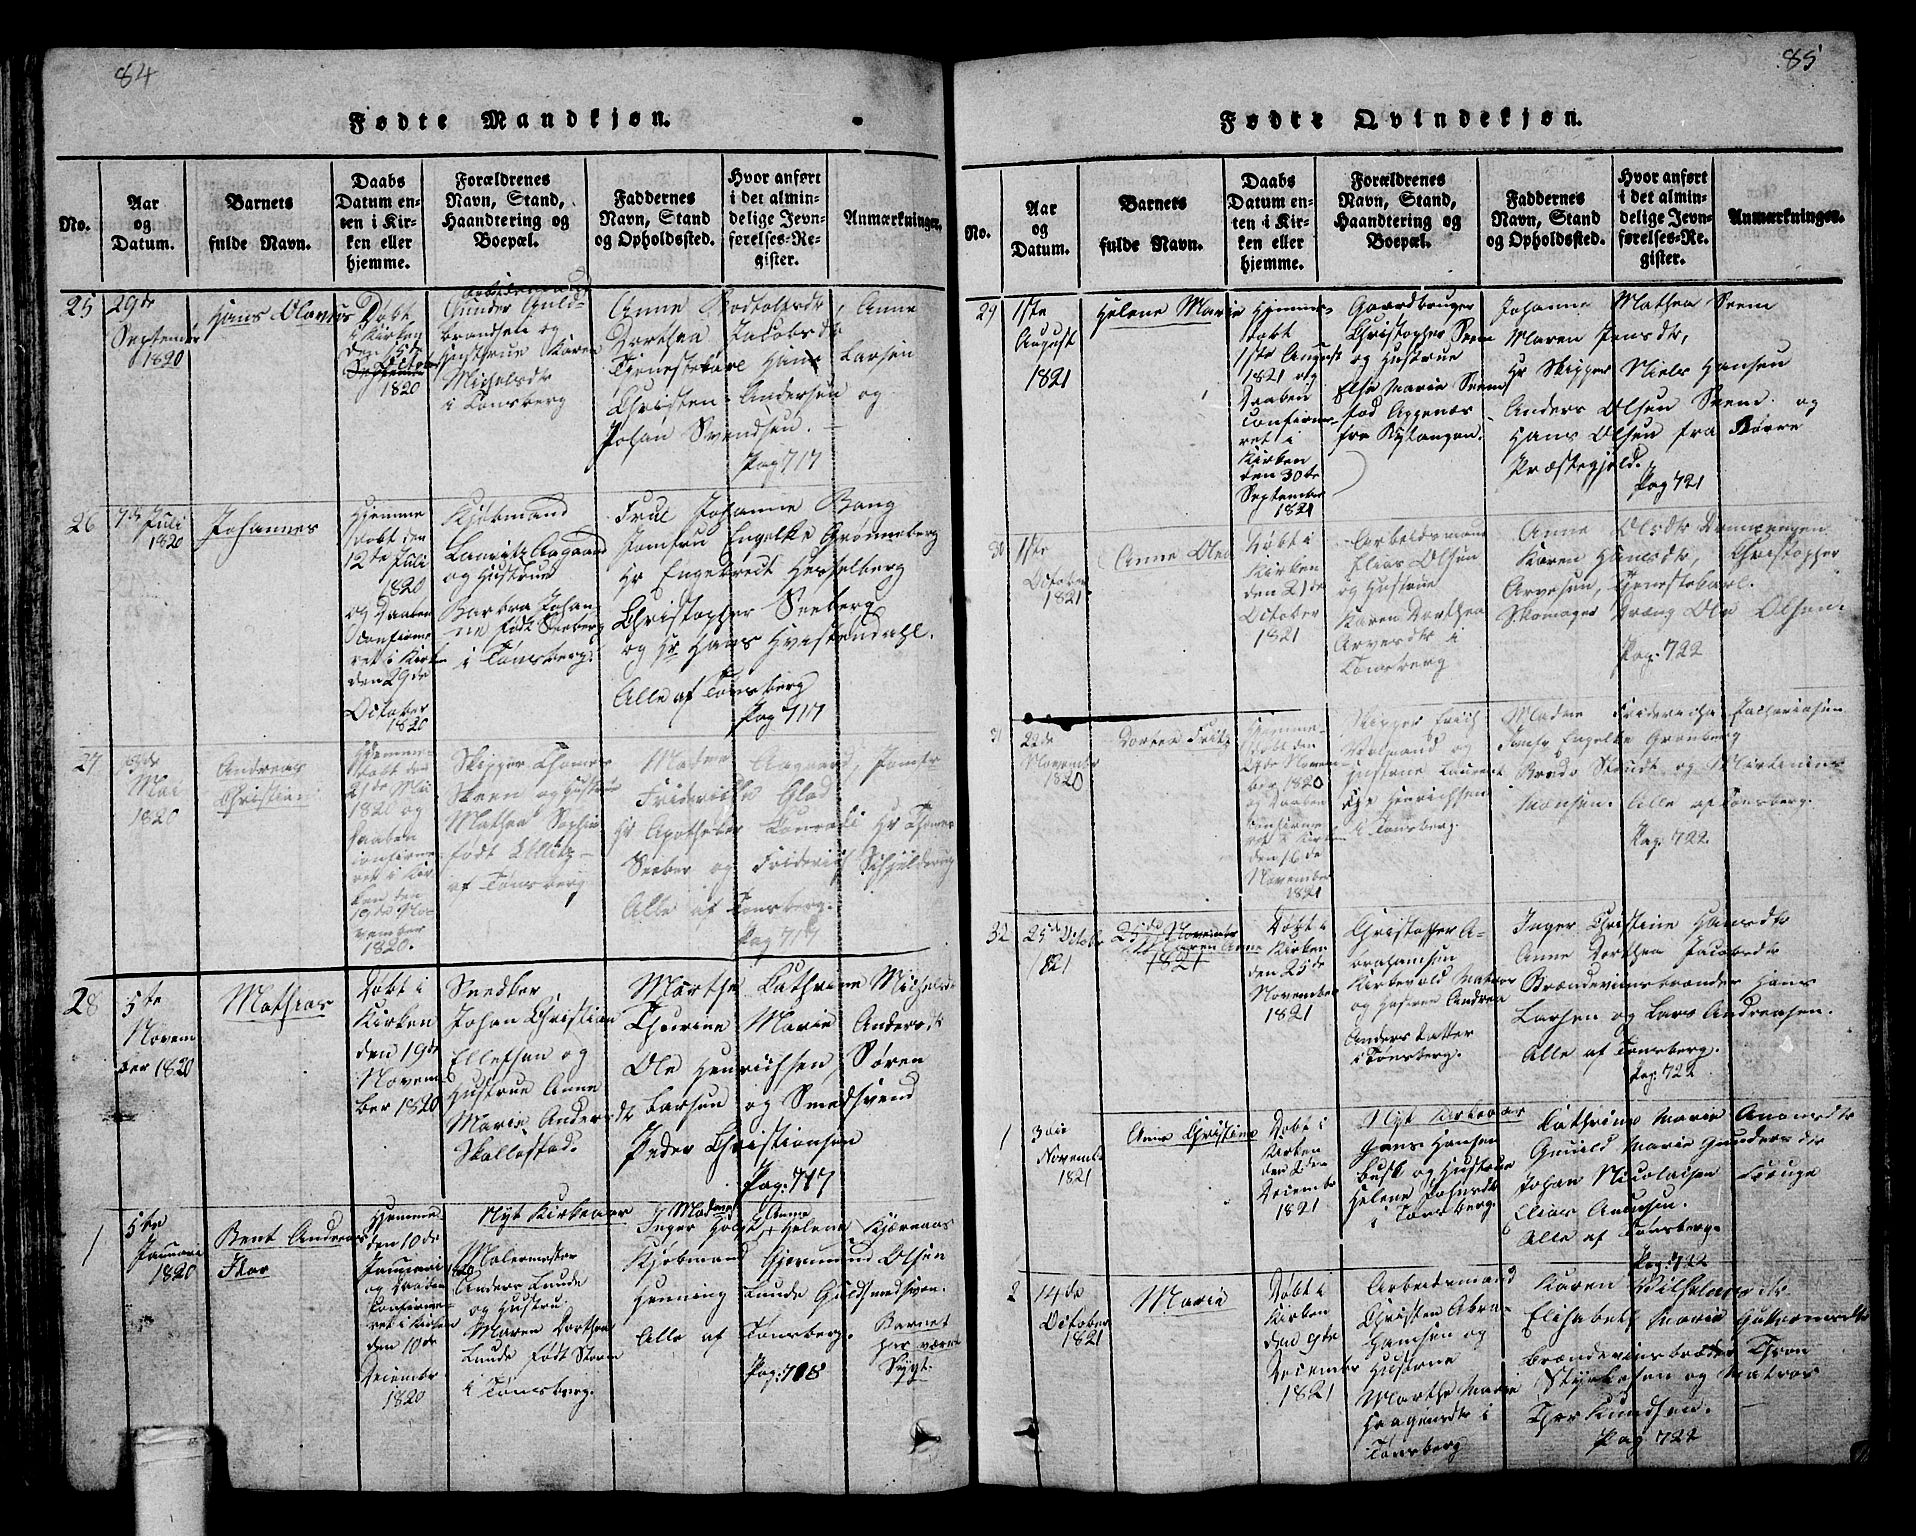 SAKO, Tønsberg kirkebøker, G/Ga/L0001: Parish register (copy) no. 1, 1813-1826, p. 84-85